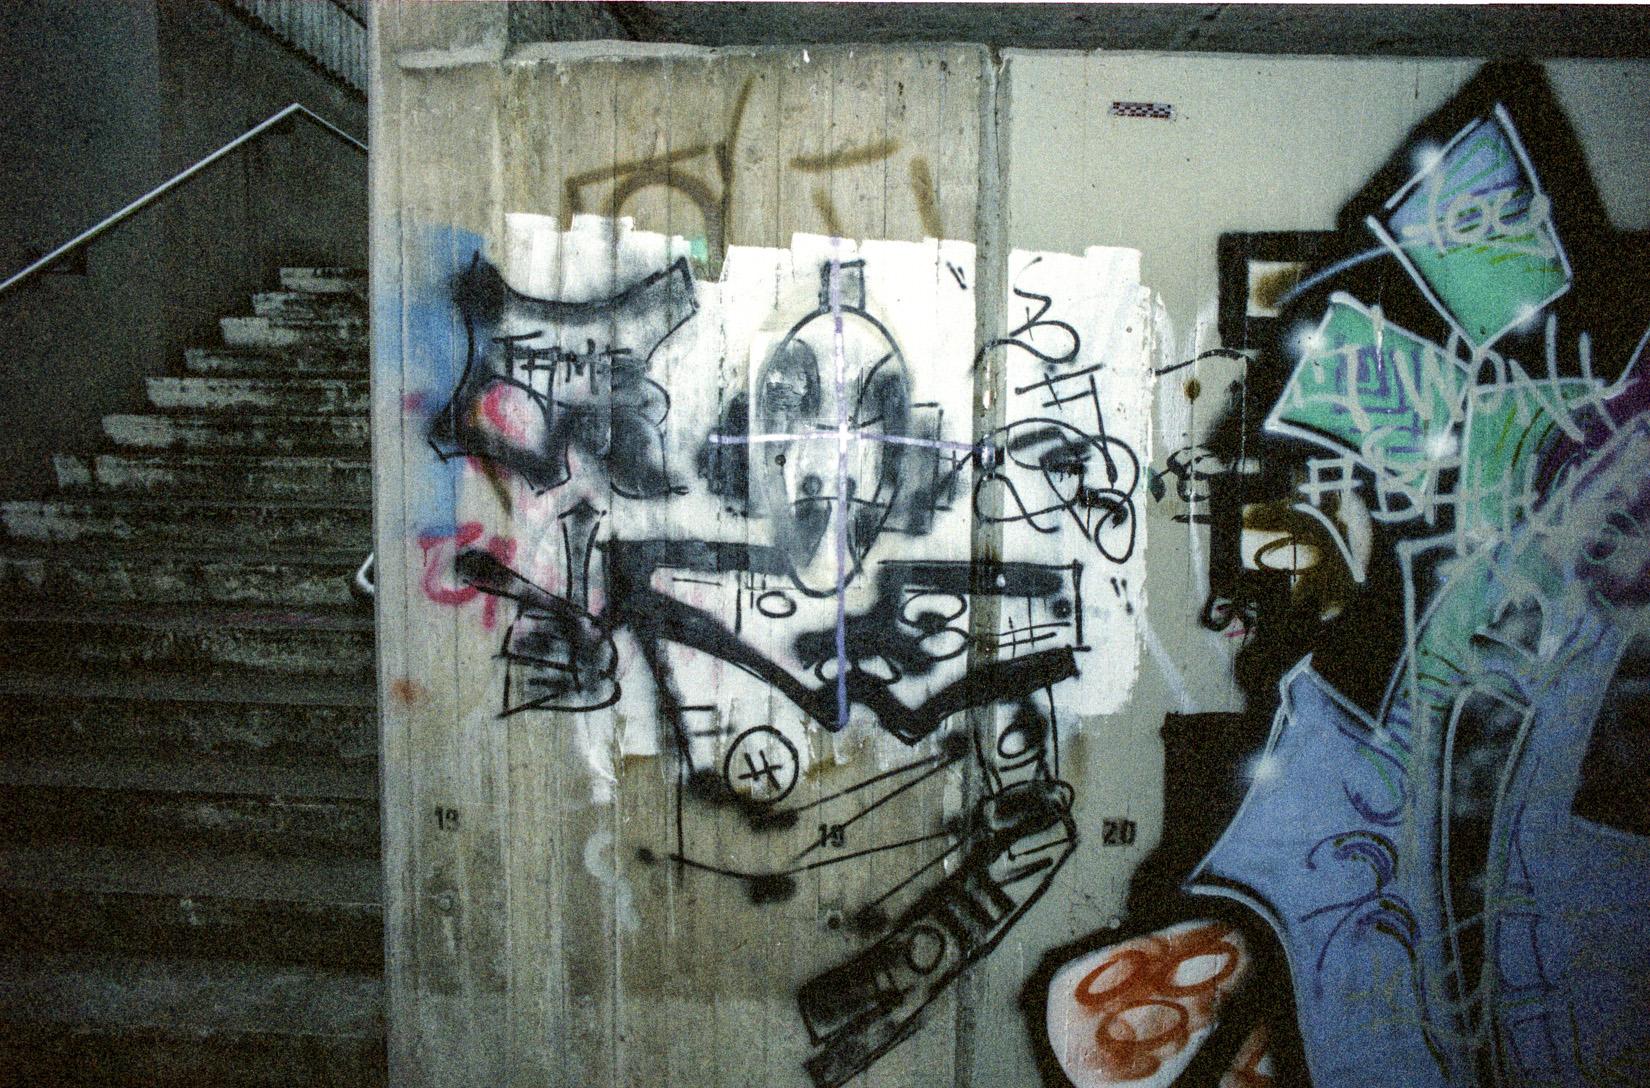 Frankfurt_Graffiti_1988_1989_H88_FRC (5 von 25)